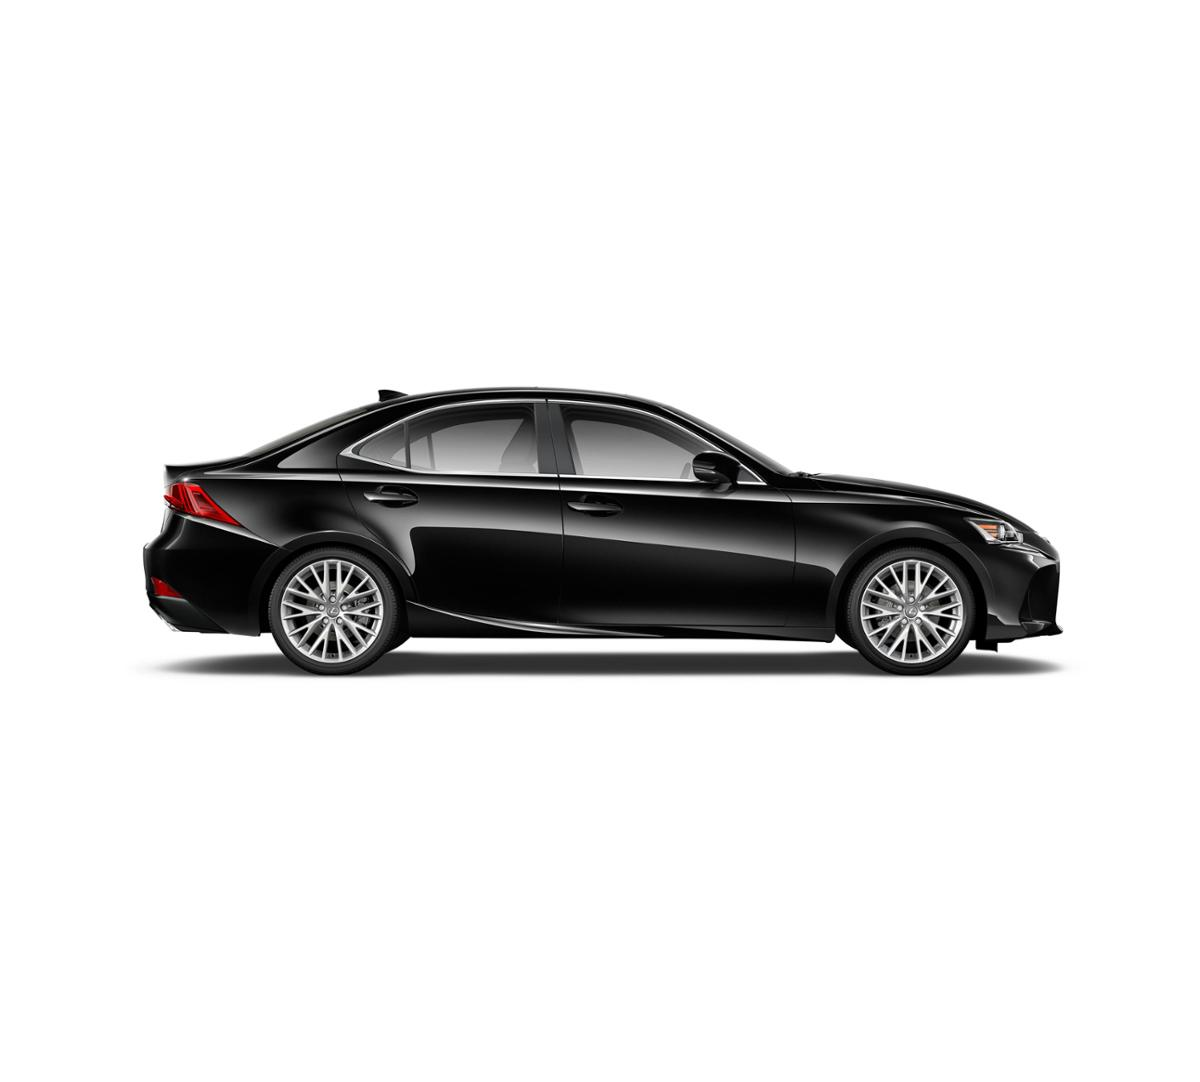 brentwood obsidian 2017 lexus is turbo new car for sale b170051 near murfreesboro. Black Bedroom Furniture Sets. Home Design Ideas